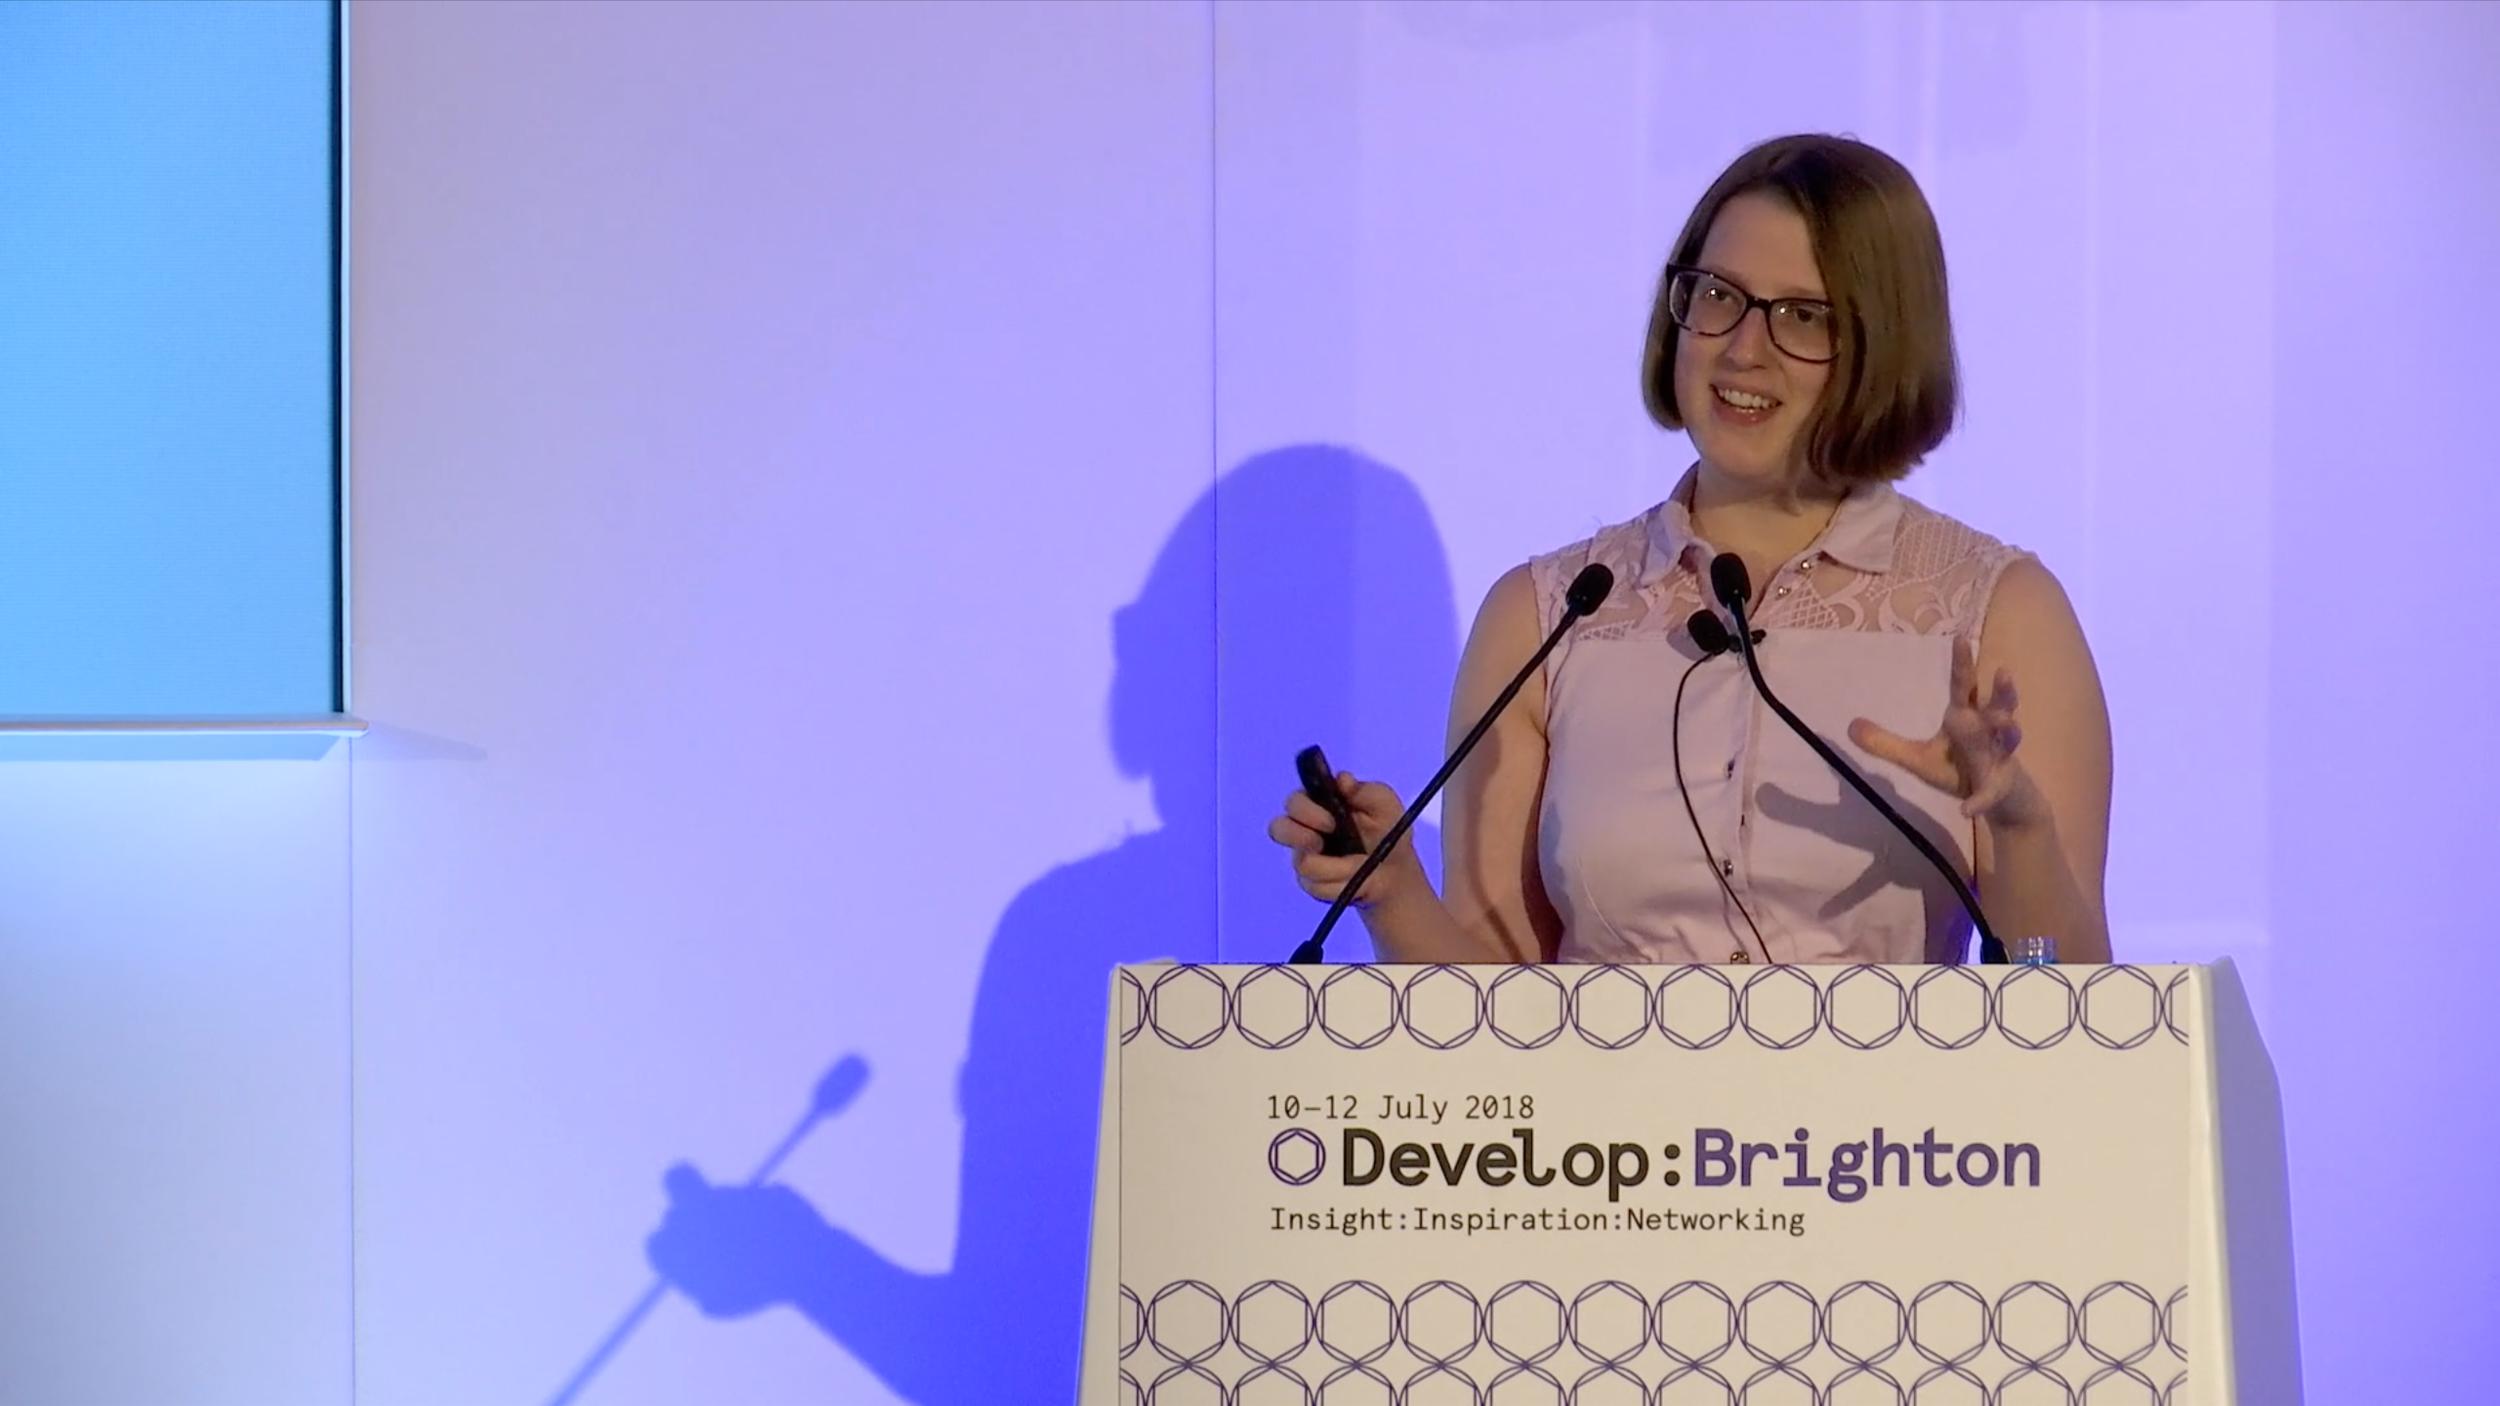 2018-07-10 Develop conference Brighton Jordan Erica Webber five stars best games of 2018 so far.png